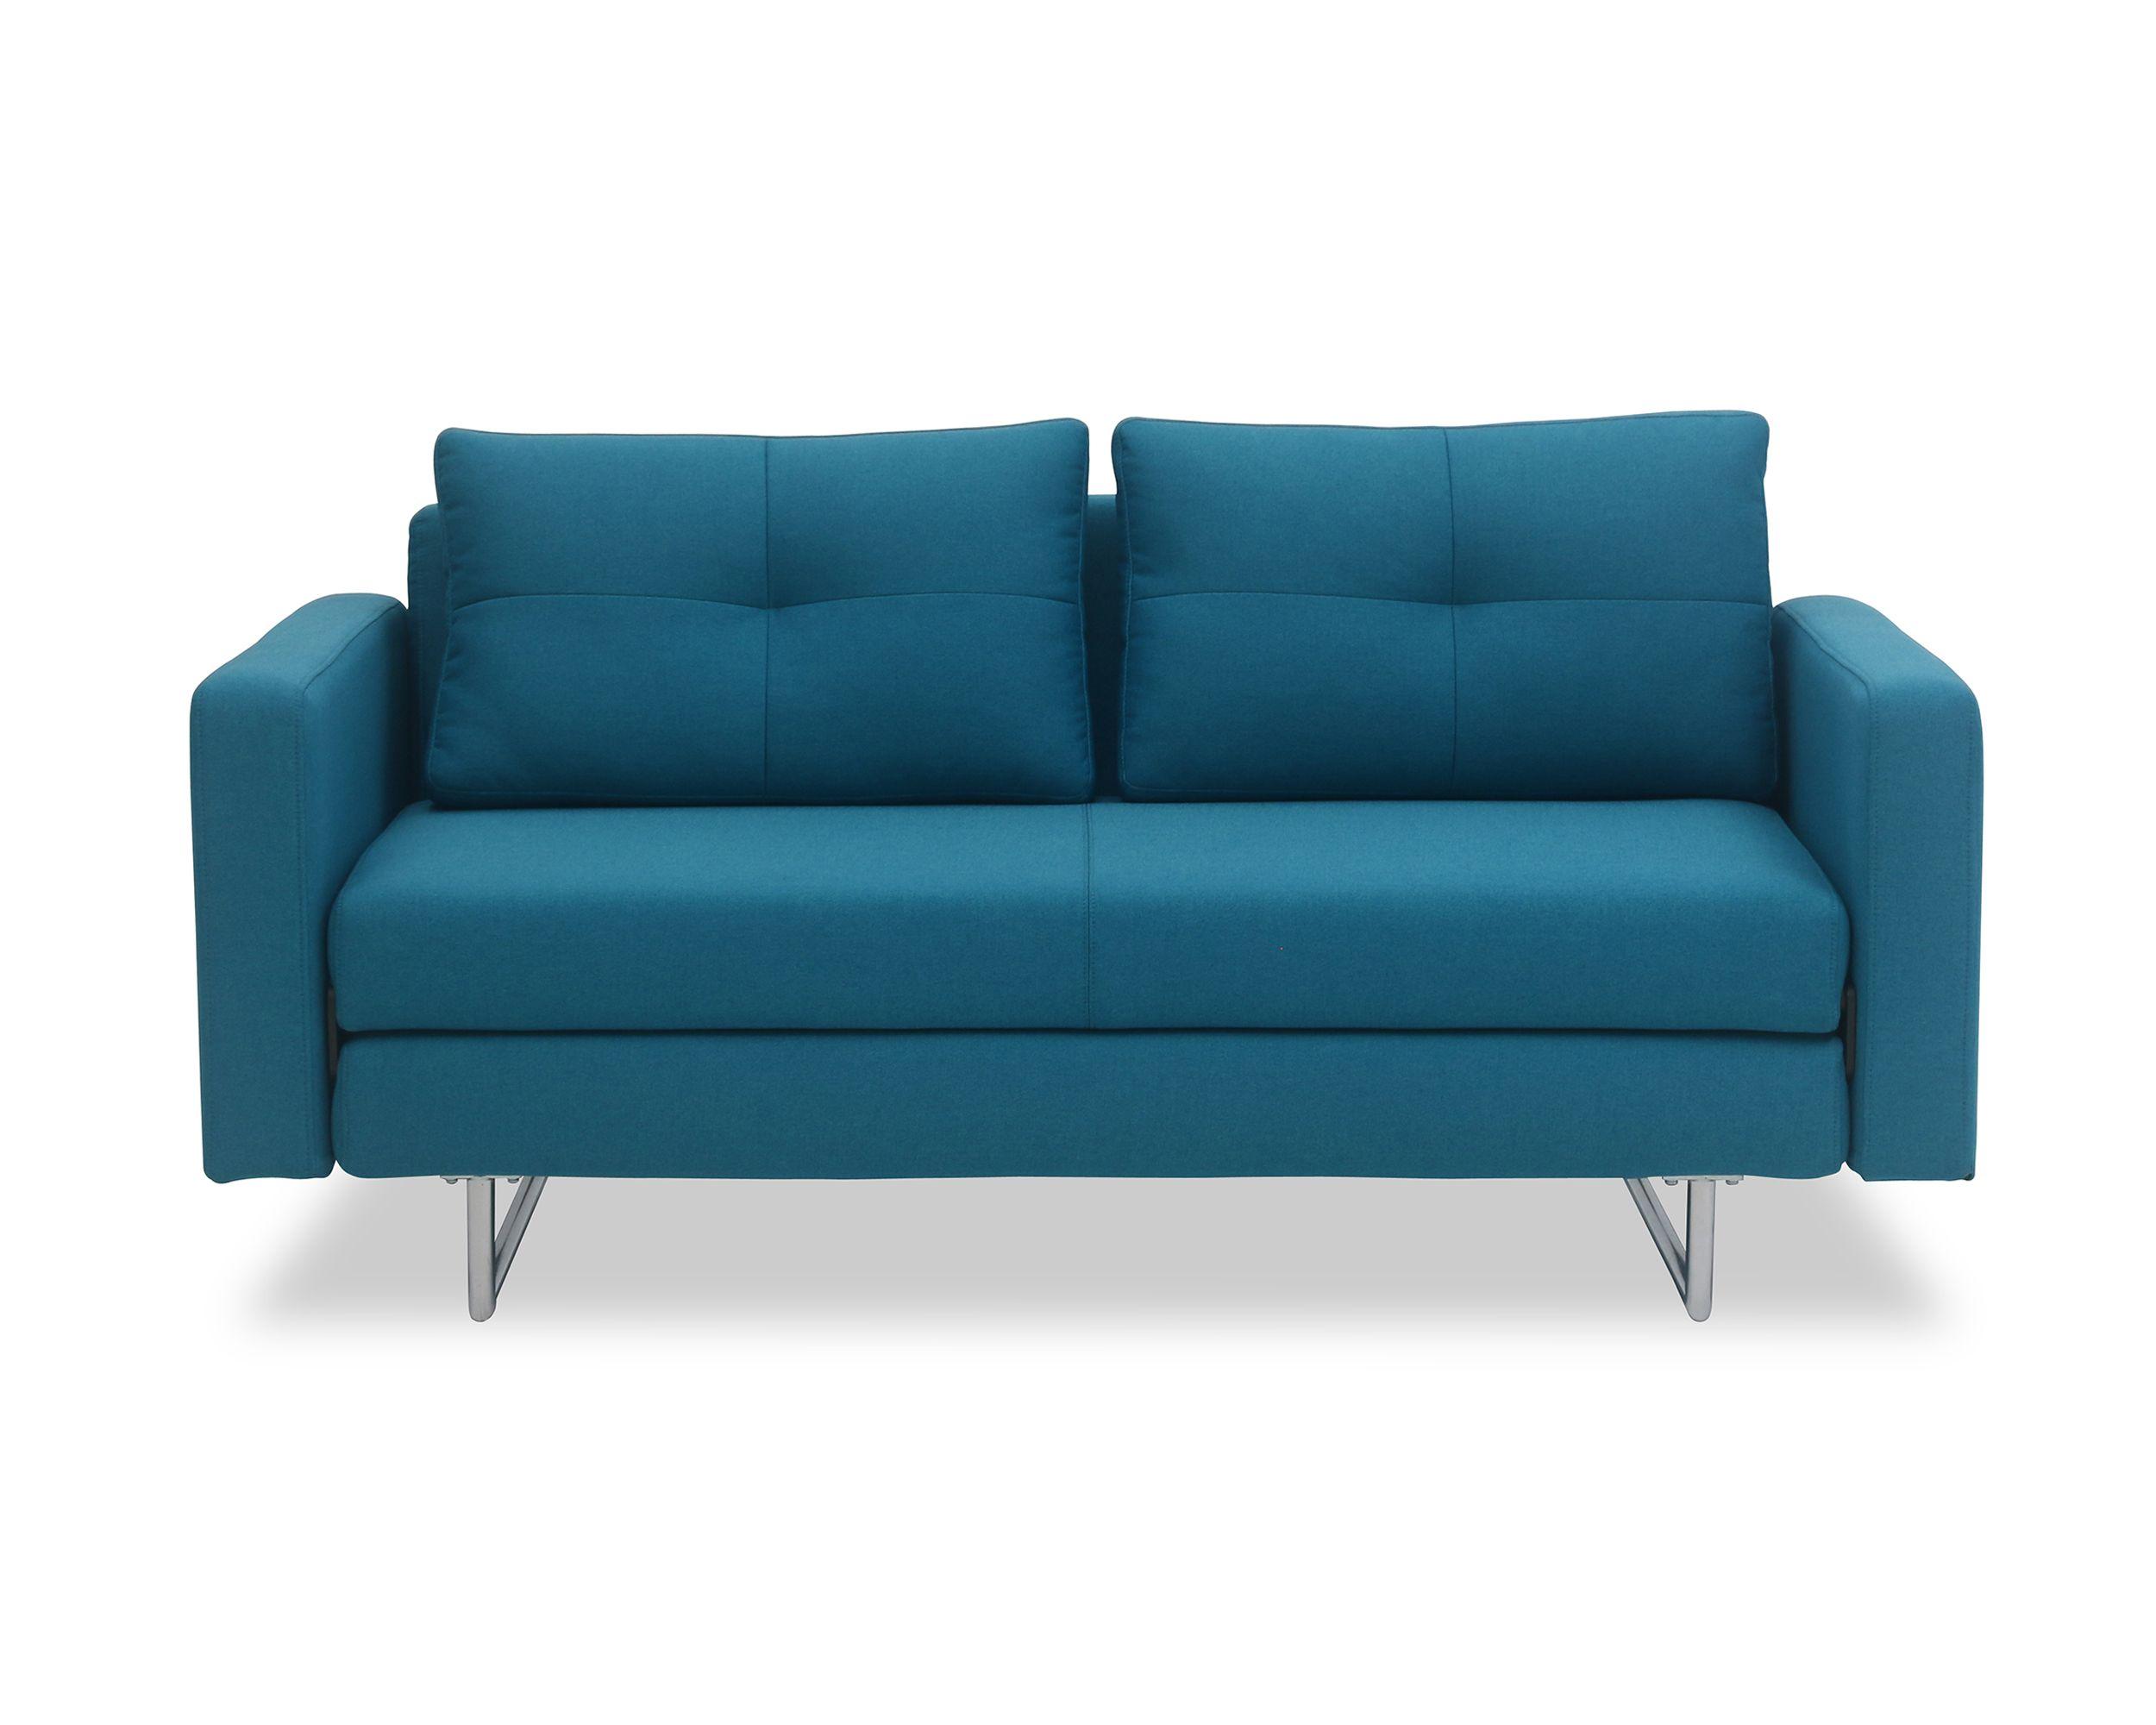 Alaska 2 Seat Sofa Bed